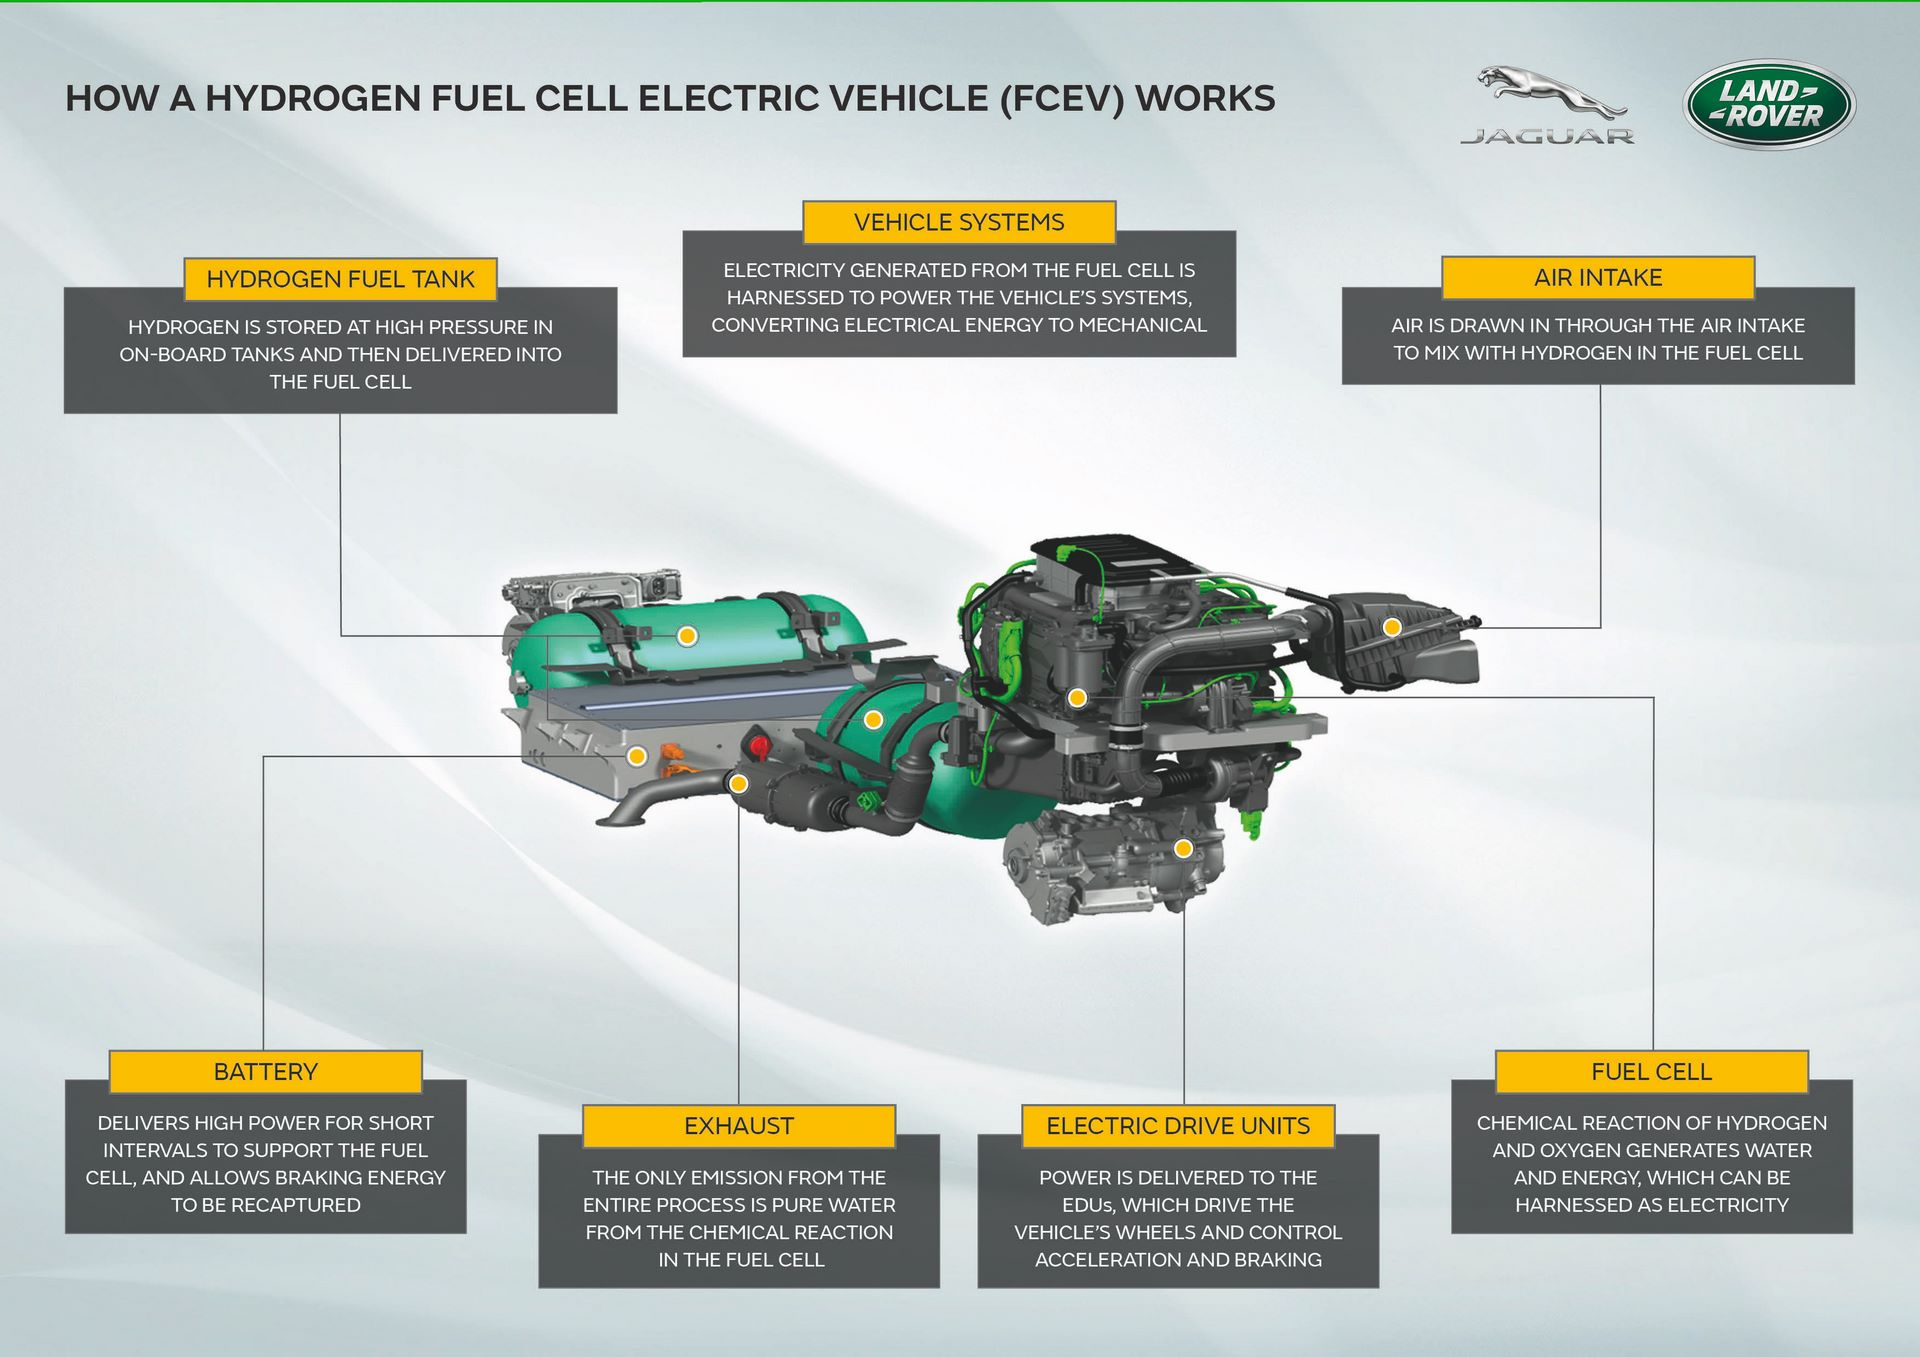 Land-Rover-Defender-Fuel-Cell-Hydrogen-concept-6